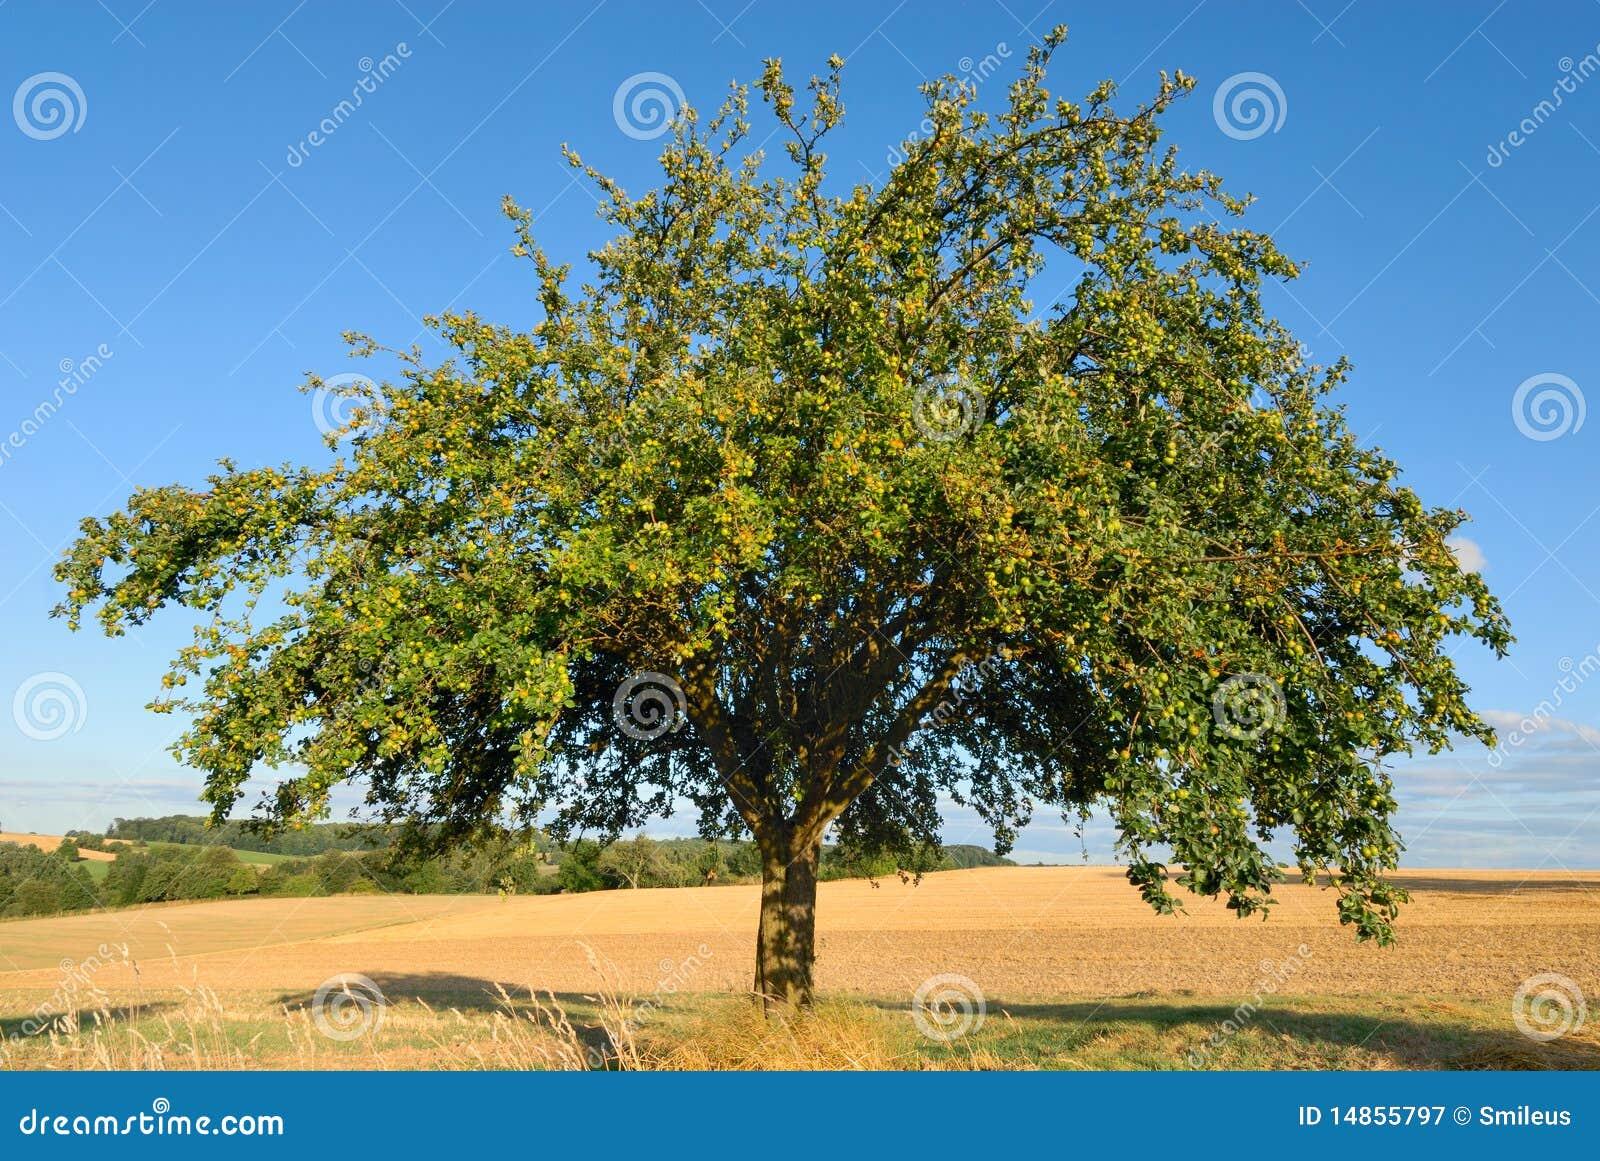 Single apple tree in mid-summer